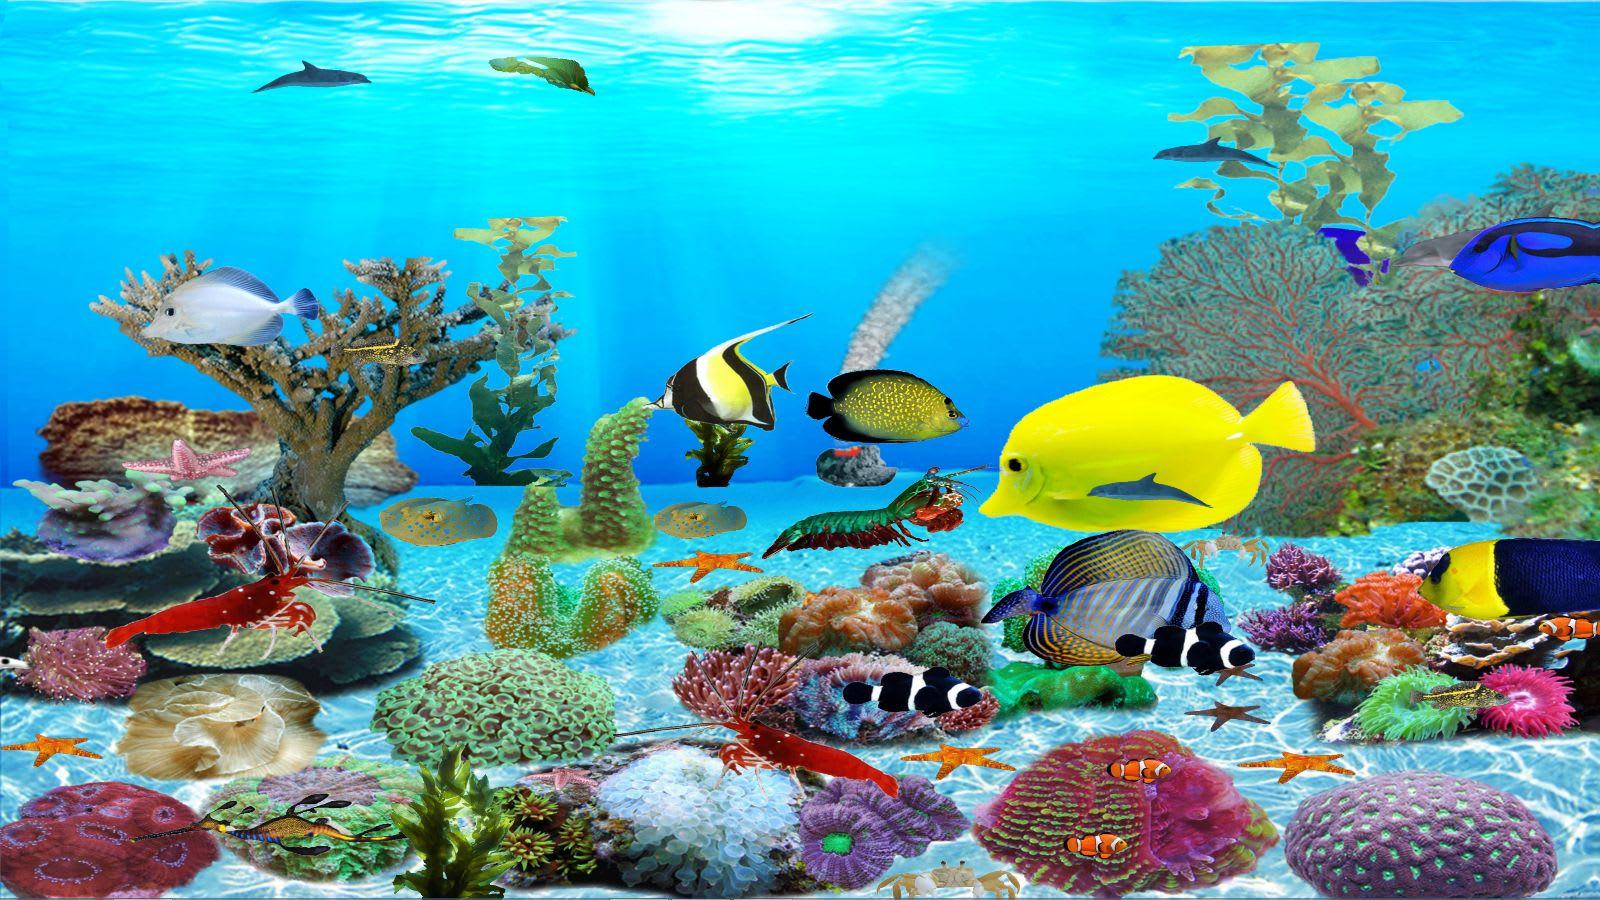 Dolphins aquarium download - Fish tank screensaver pc free ...